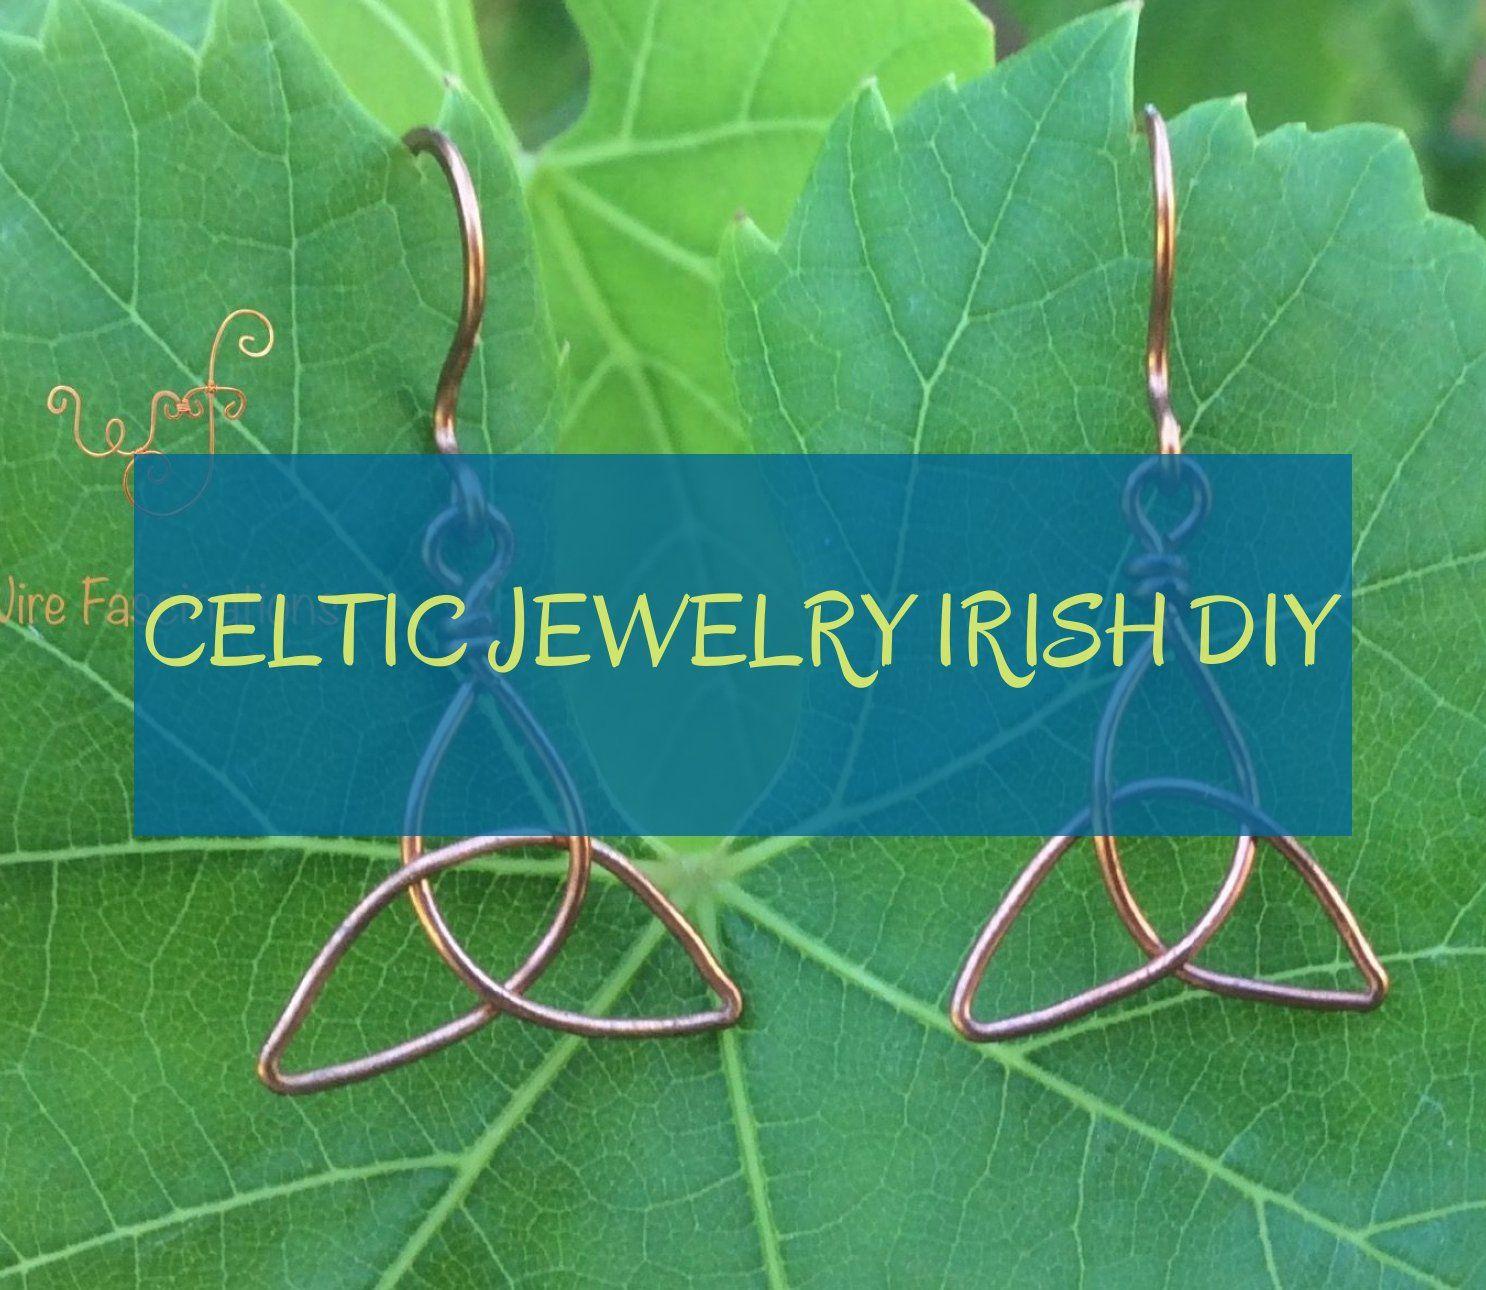 celtic jewelry irish diy